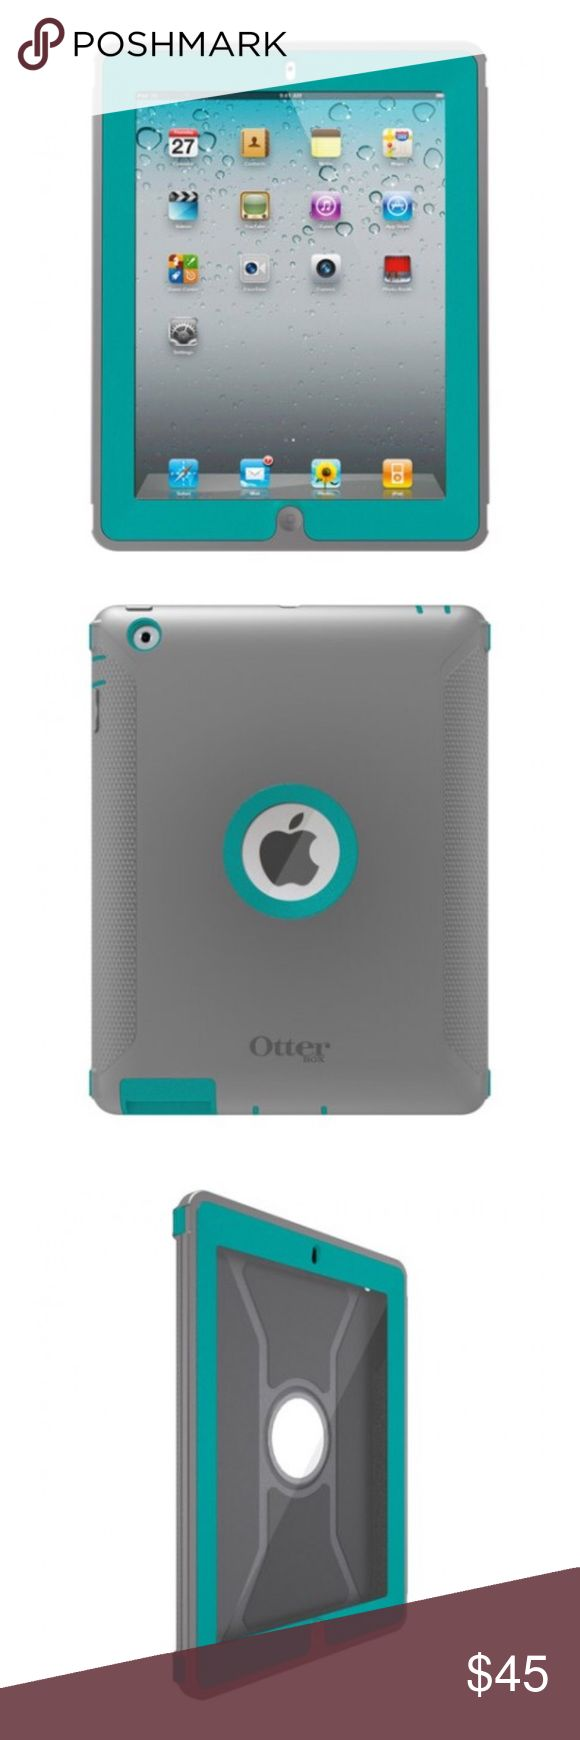 OTTERBOX DEFENDER SERIES CASE FOR IPAD 4/3/2 OTTERBOX DEFENDER SERIES CASE FOR IPAD 4/3/2 - GREY TURQUOISE HARBOR. Compatibility: Apple iPad with Retina display / iPad 4th generation (16GB, 32GB, 64GB), Apple new iPad / iPad 3 (16GB, 32GB, 64GB), Apple iPad 2 (16GB, 32GB, 64GB).  Excellent condition!! OtterBox Other